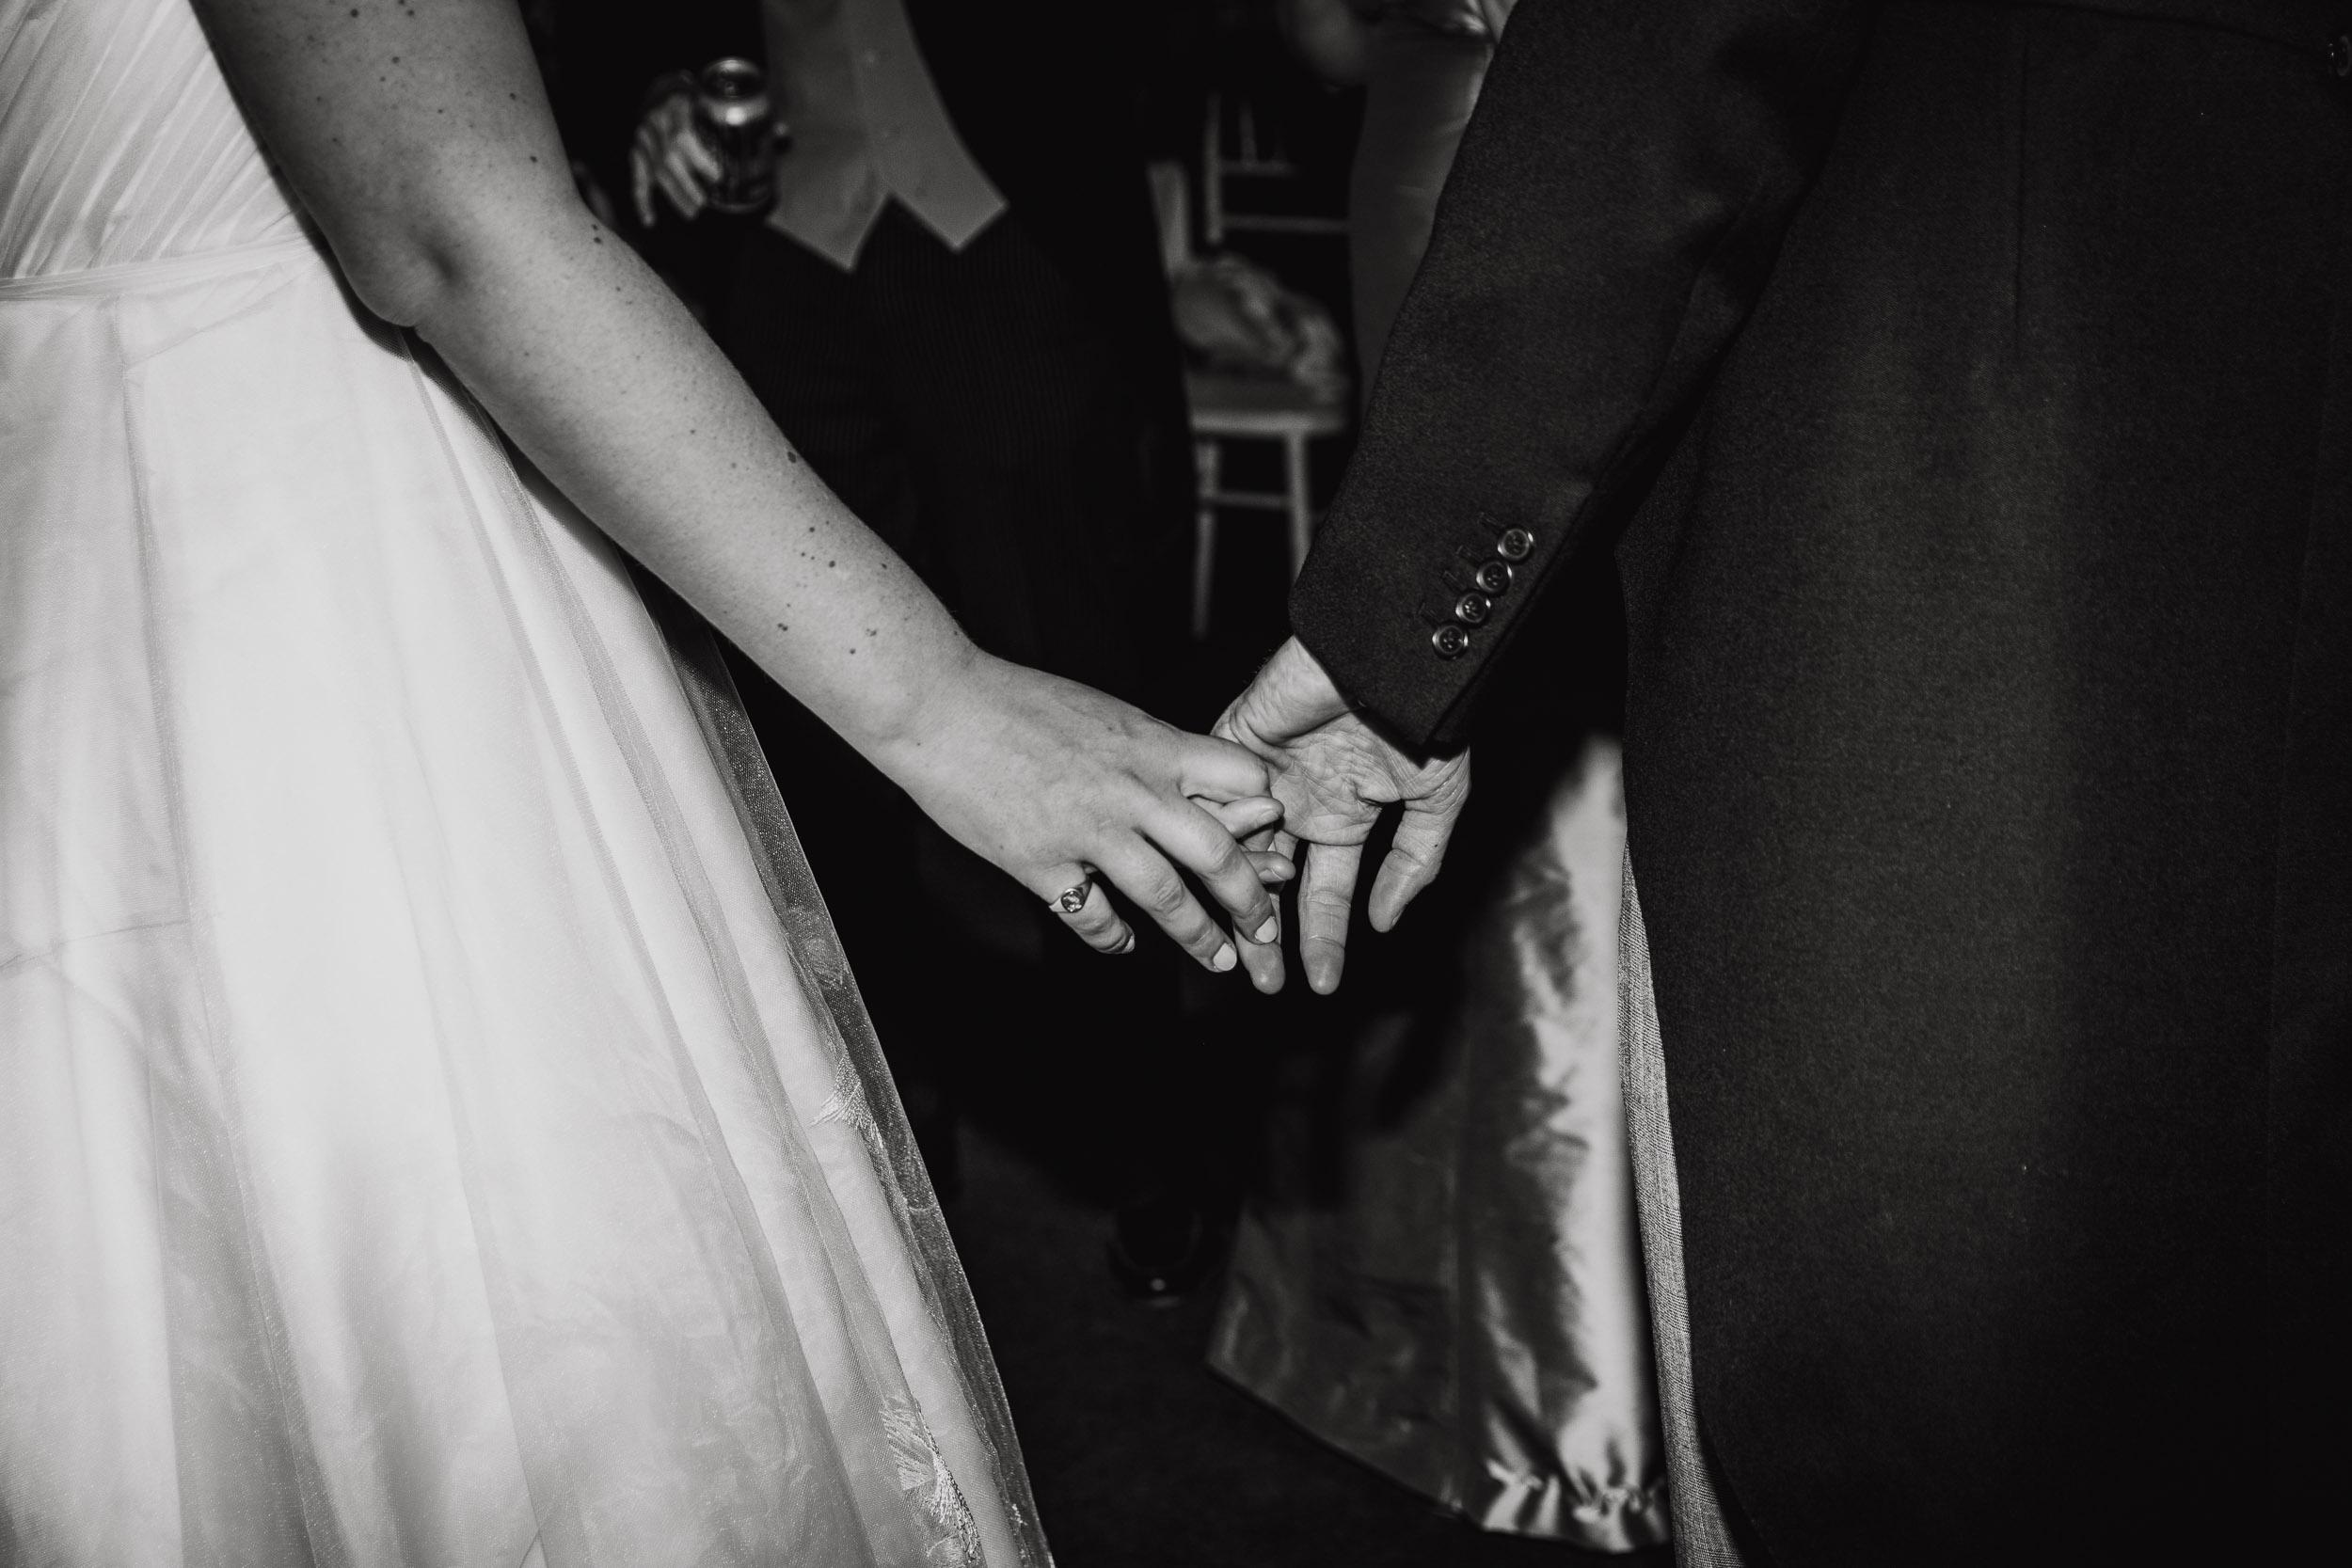 hamswell-house-wedding-photographer-w121.jpg